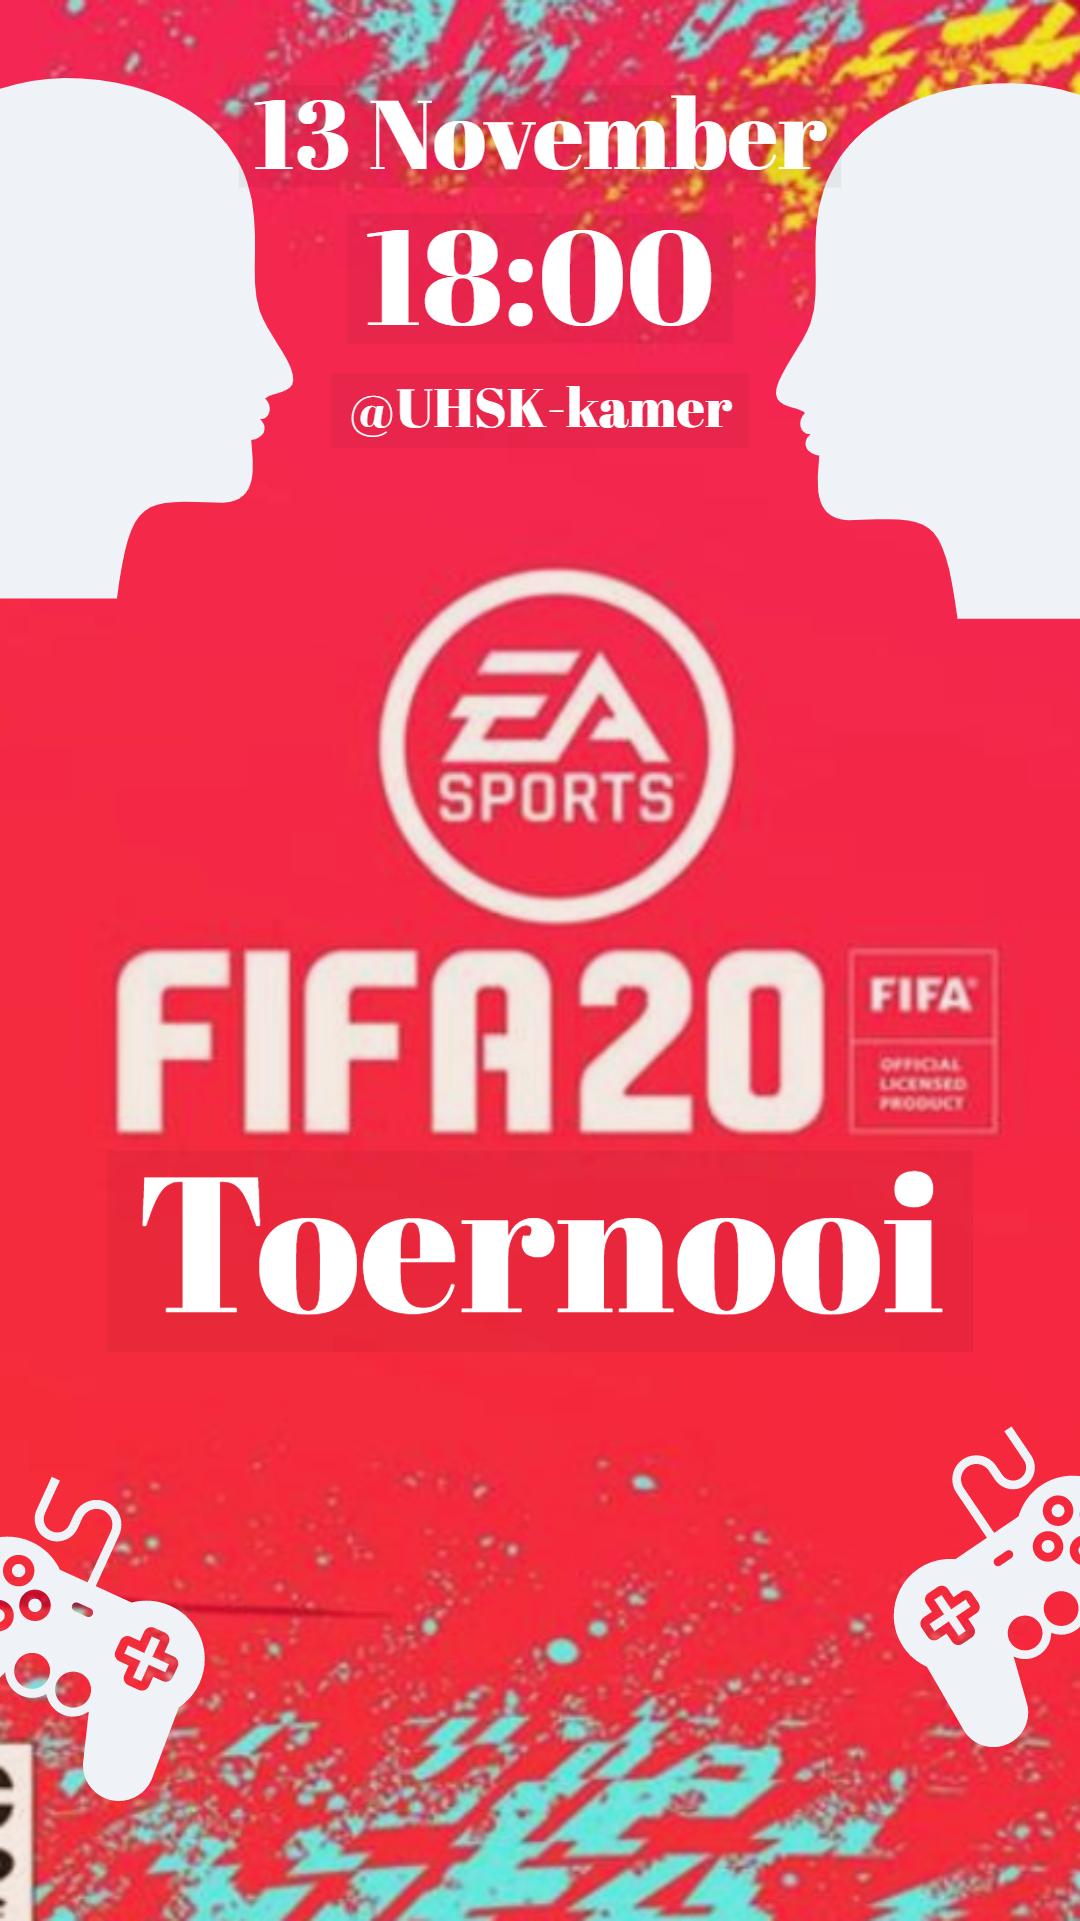 UHSK: FIFA 20 Toernooi